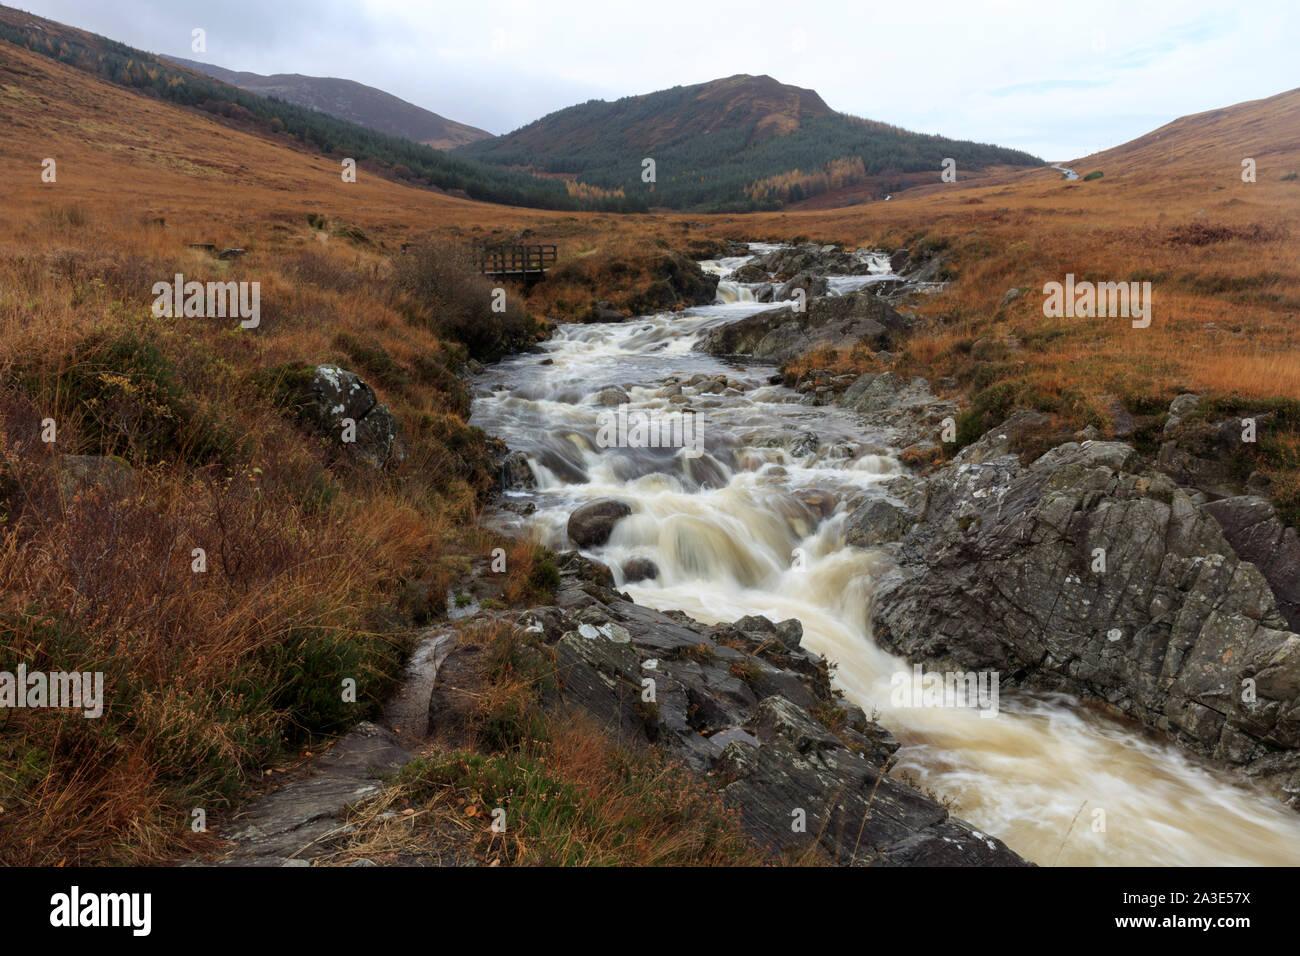 Autumn colors in Highlands of Glen Sannox at isle of arran, Scotland. Stock Photo